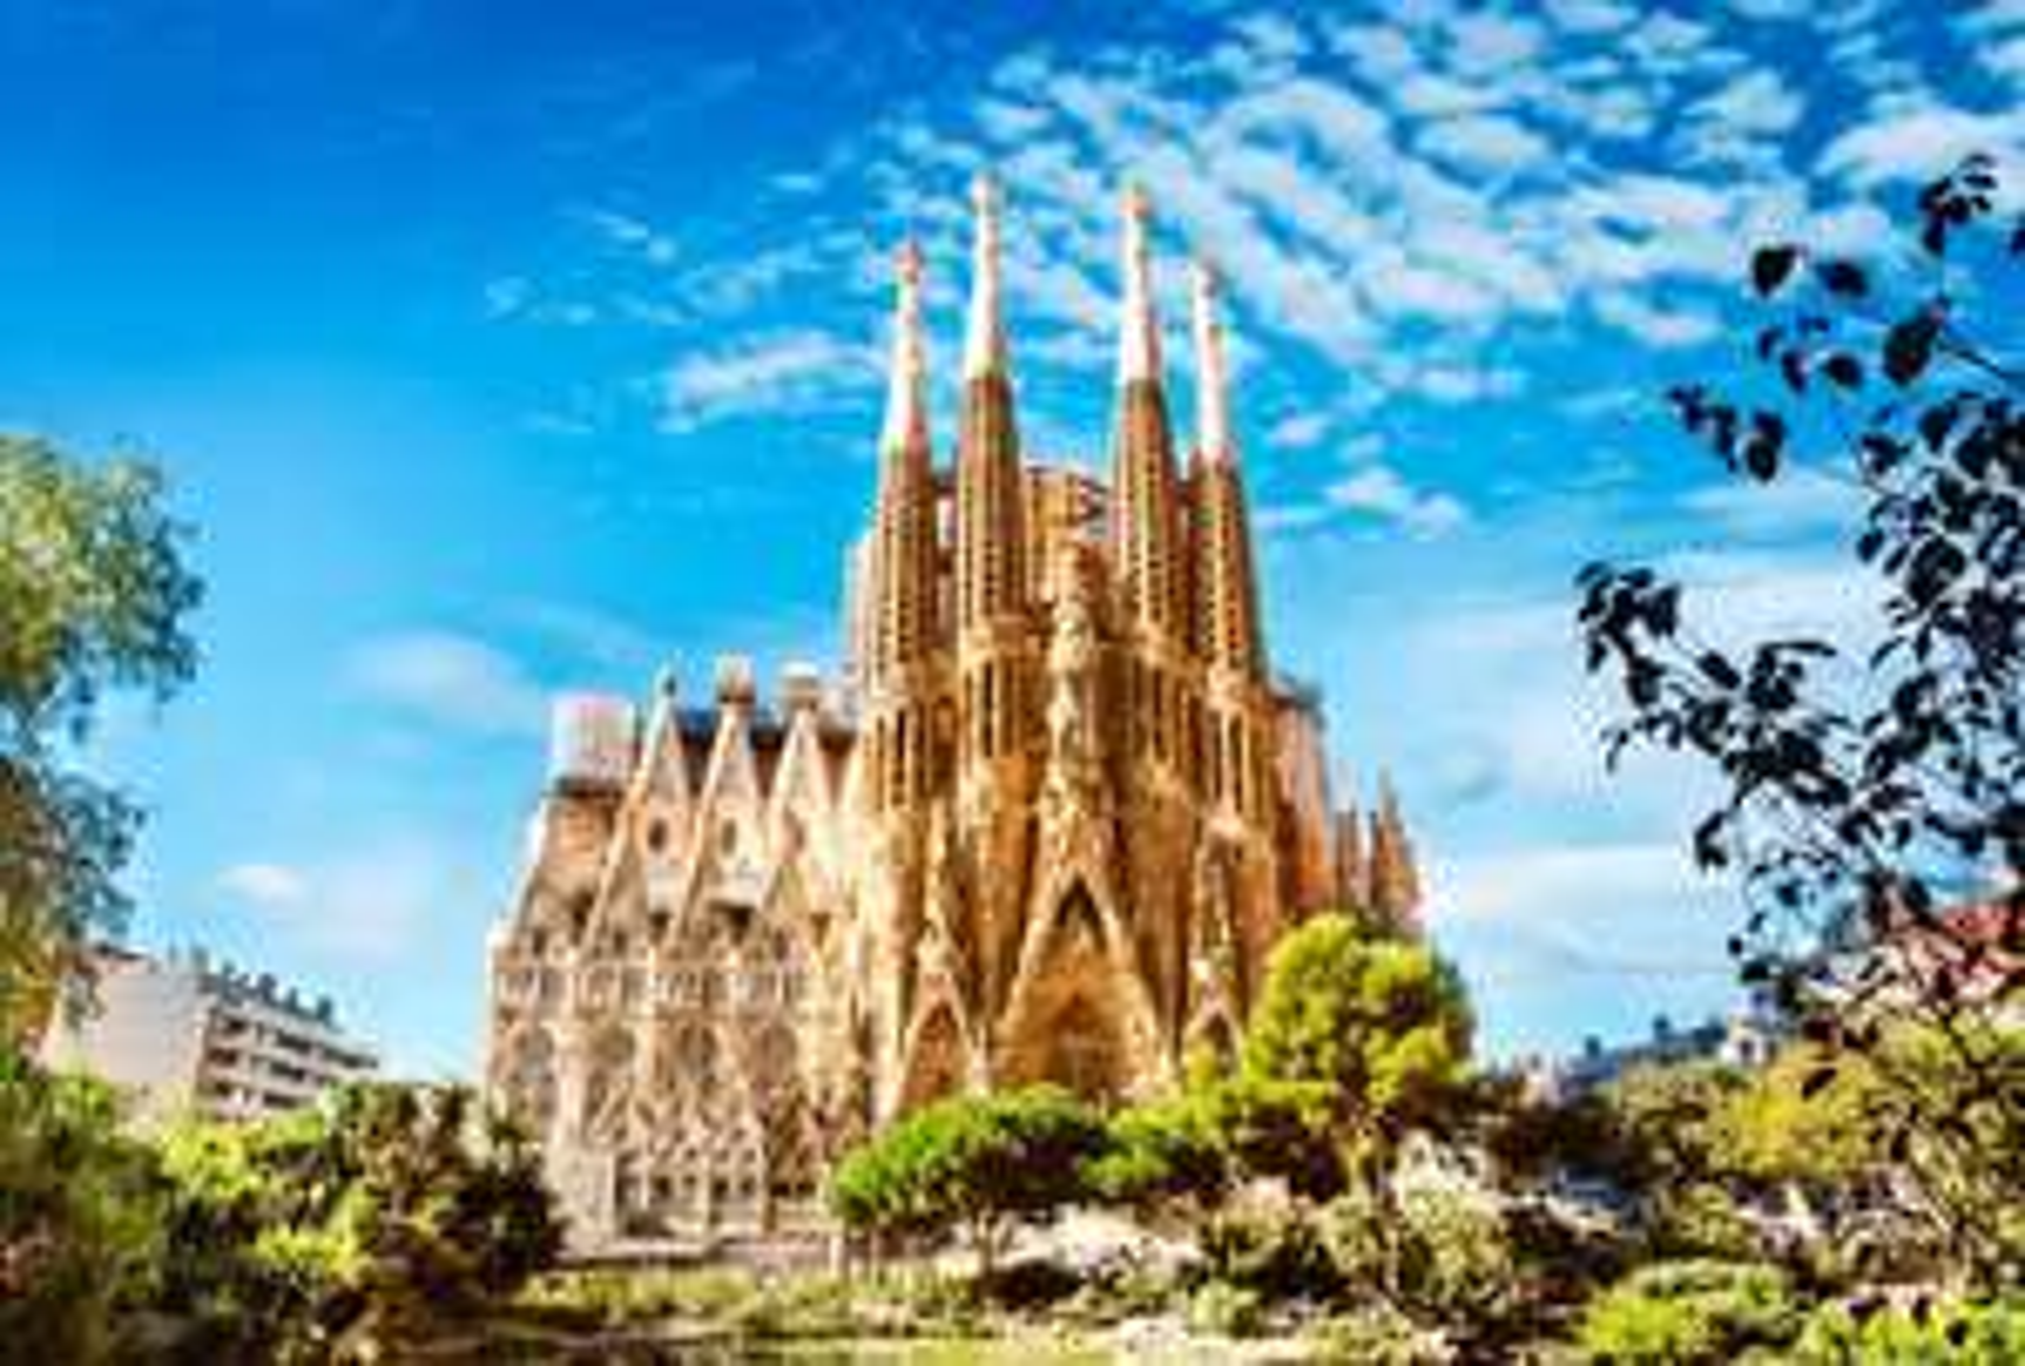 BARCELONA STÄDTETRIP  3 Tage inkl. 4 Sterne Hotel an der Sagrada Familia & den Flügen